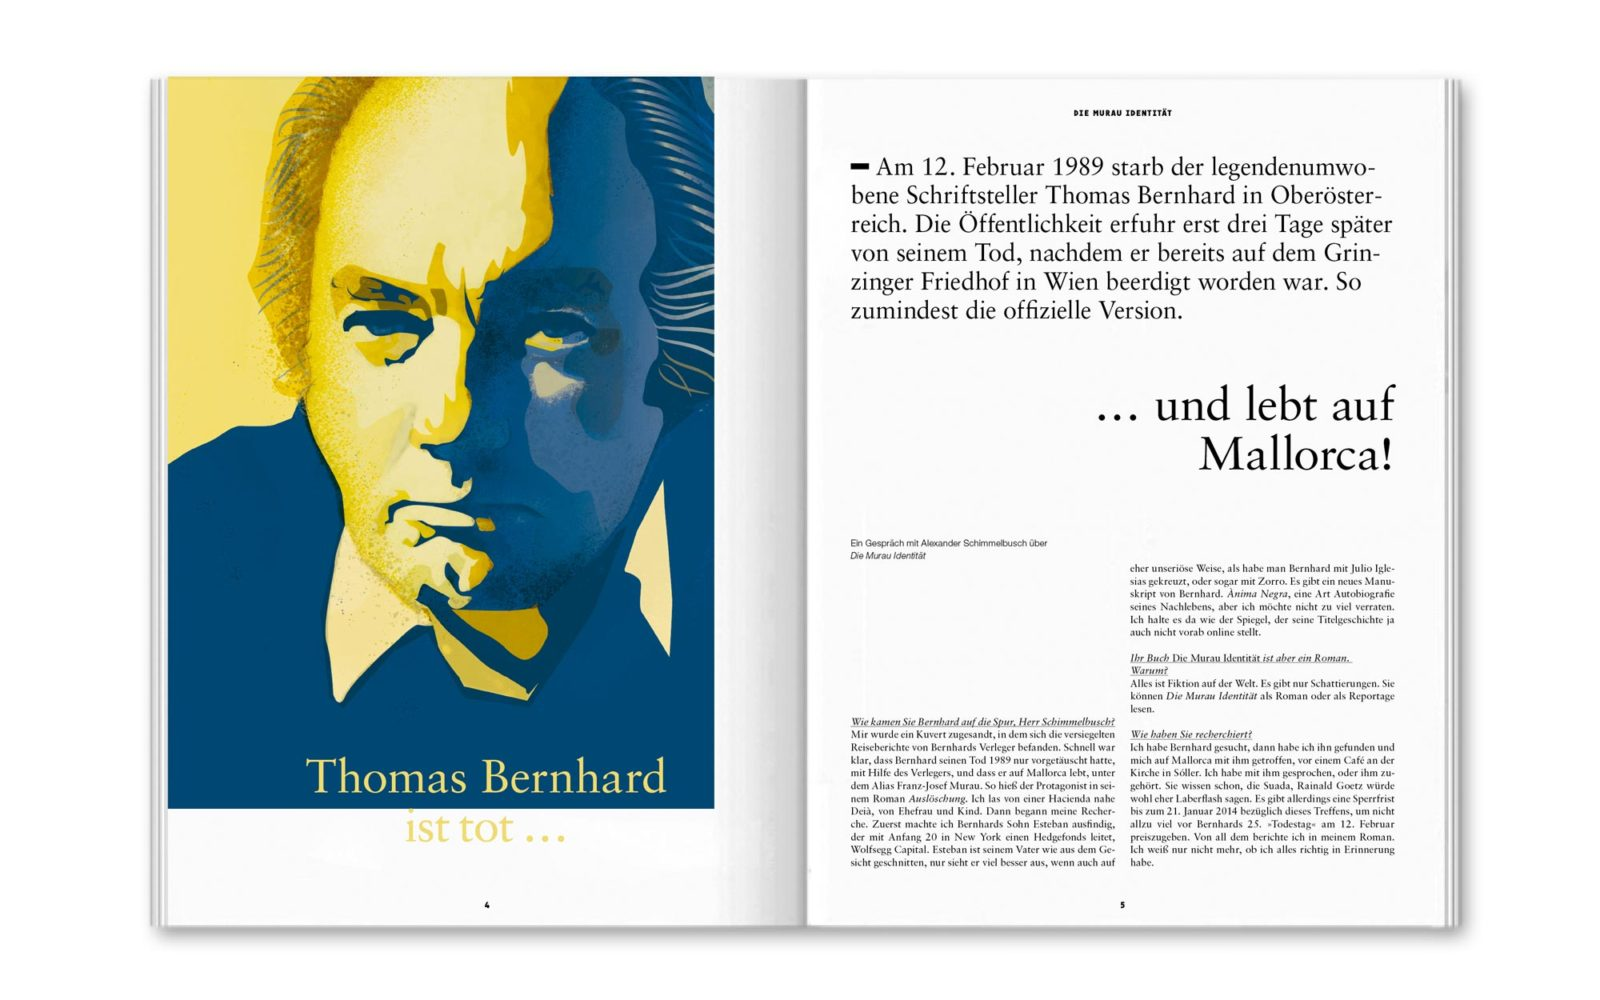 Editienne Grafikdesign - Kommunikationsdesign Berlin- Editorial Design Verlagskommunikation 22